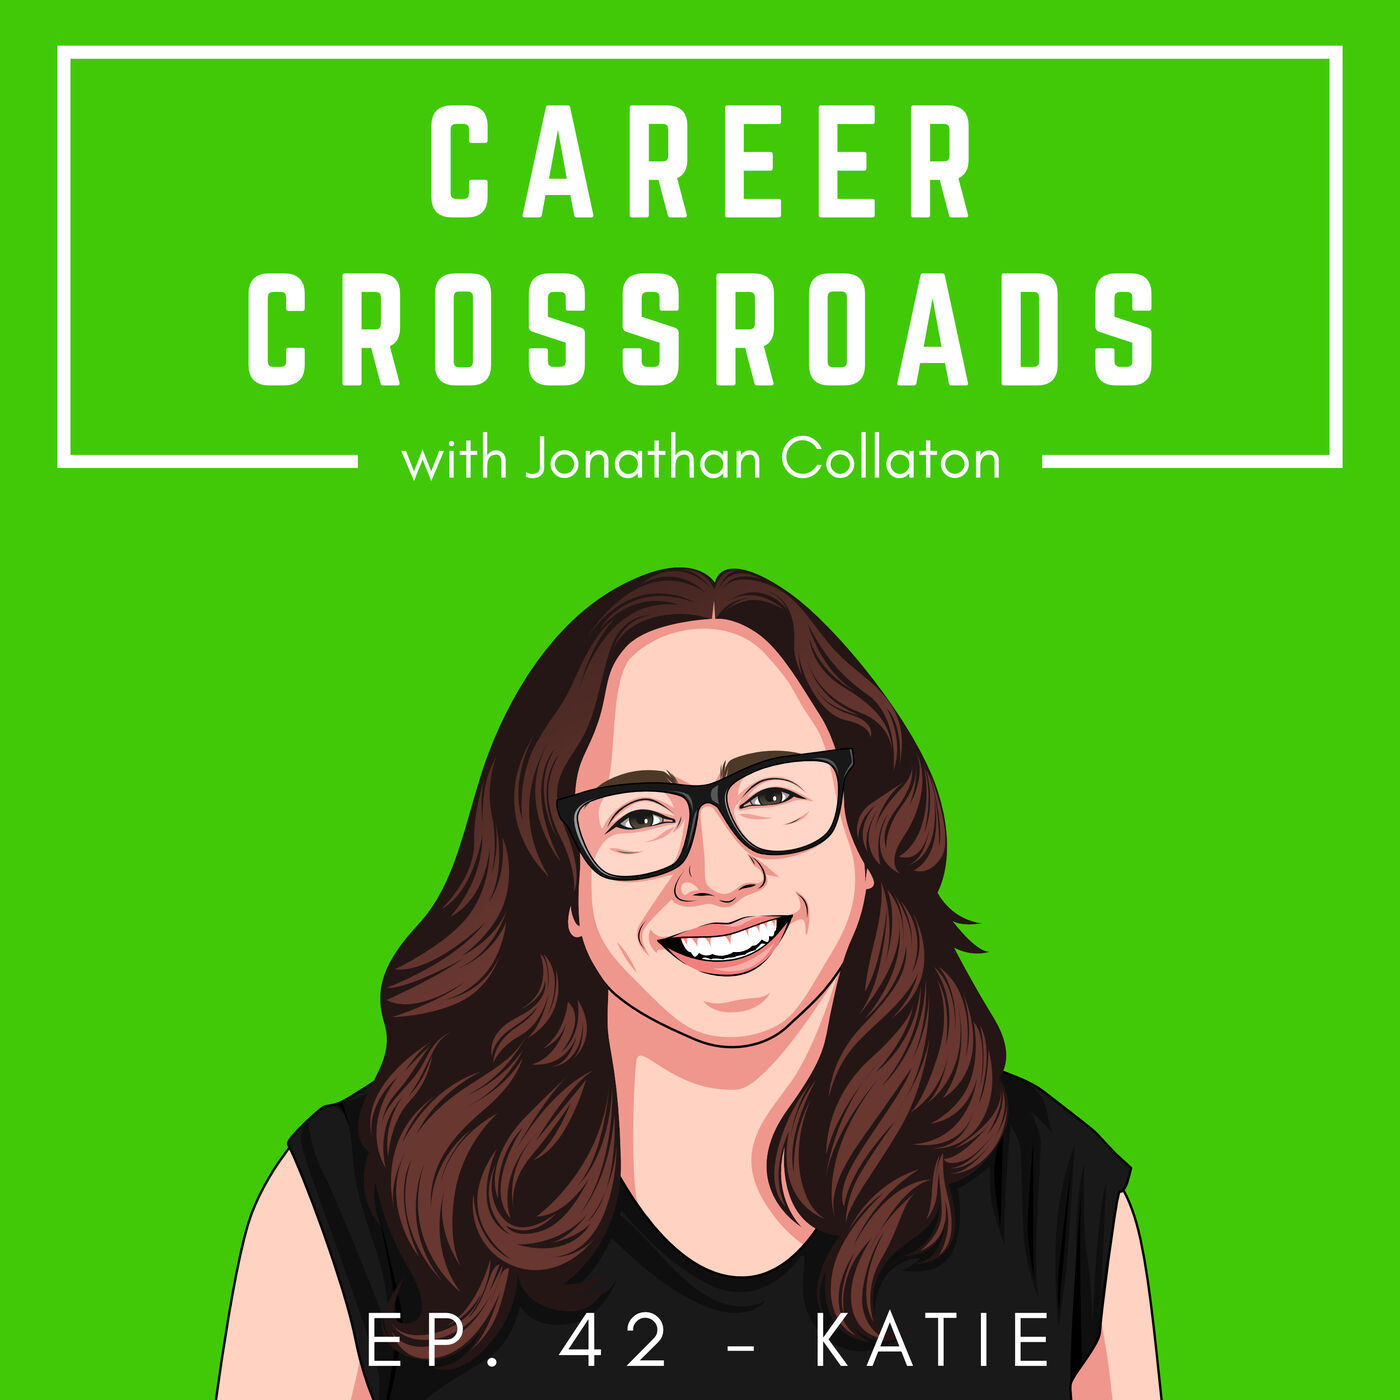 Katie - From Aquatics, to Journalism, to Teaching